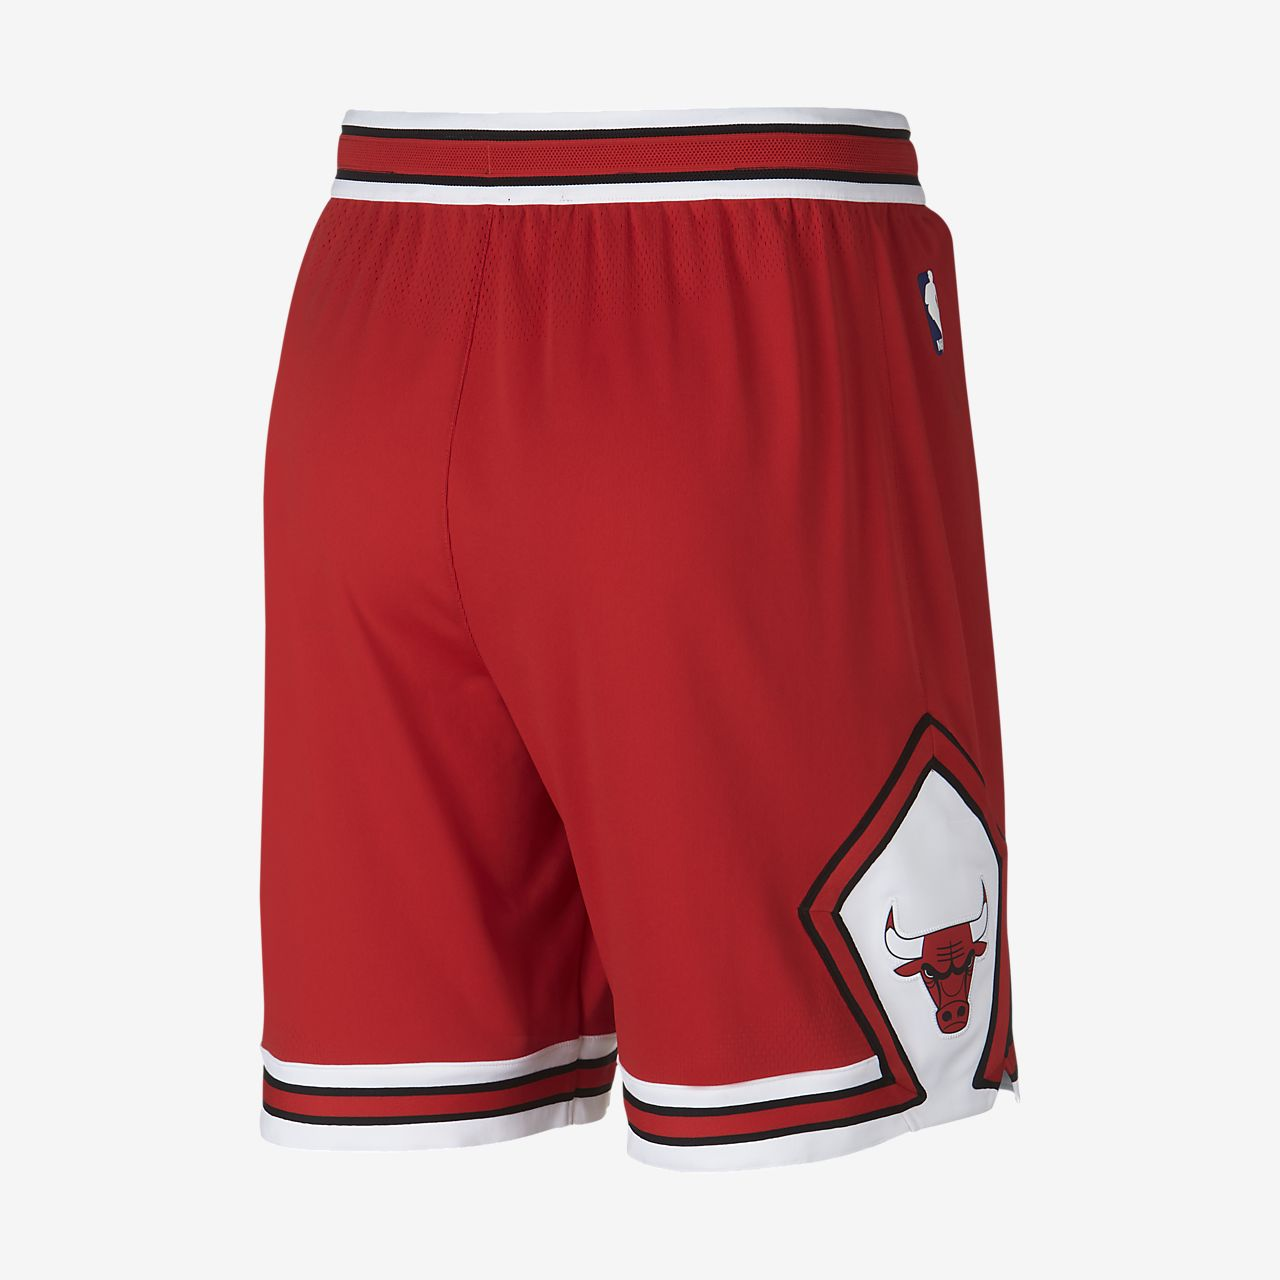 e4f20edc140 Chicago Bulls Nike Icon Edition Authentic Men's NBA Shorts. Nike.com AU